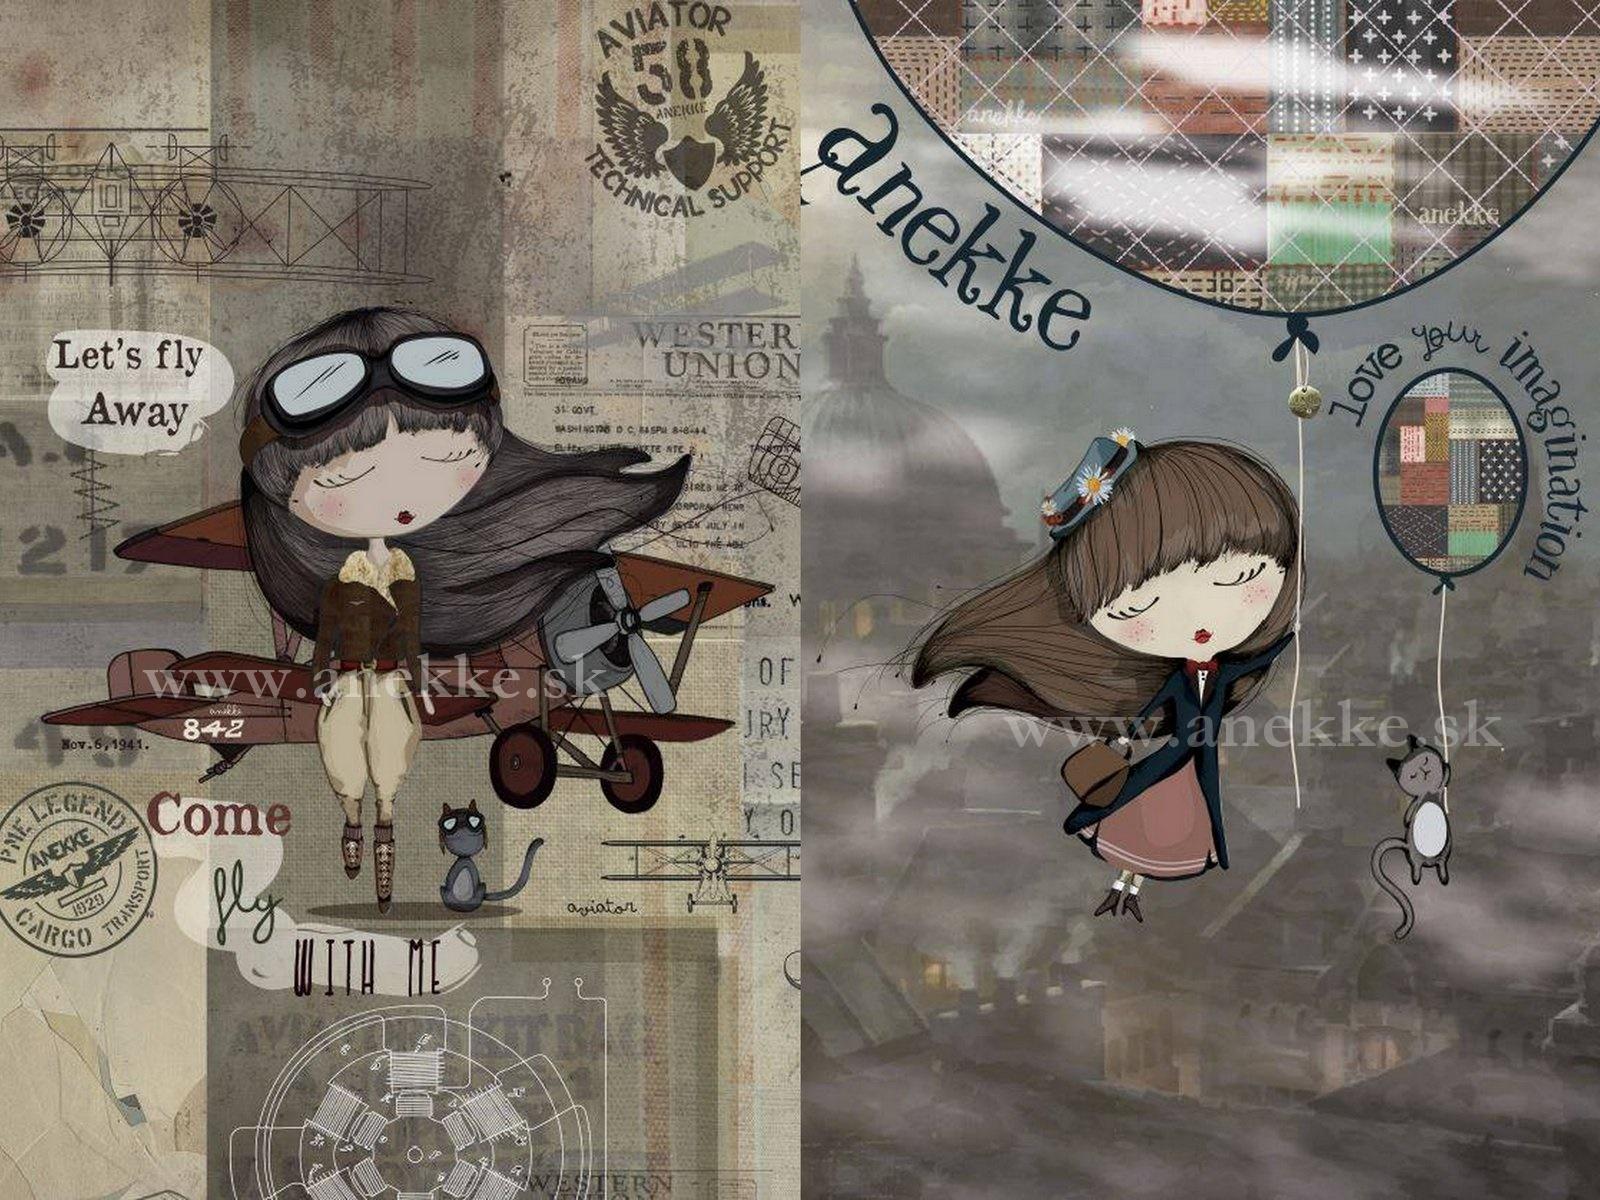 Nová jeseň/zima kolekcia španielskej značky Anekke